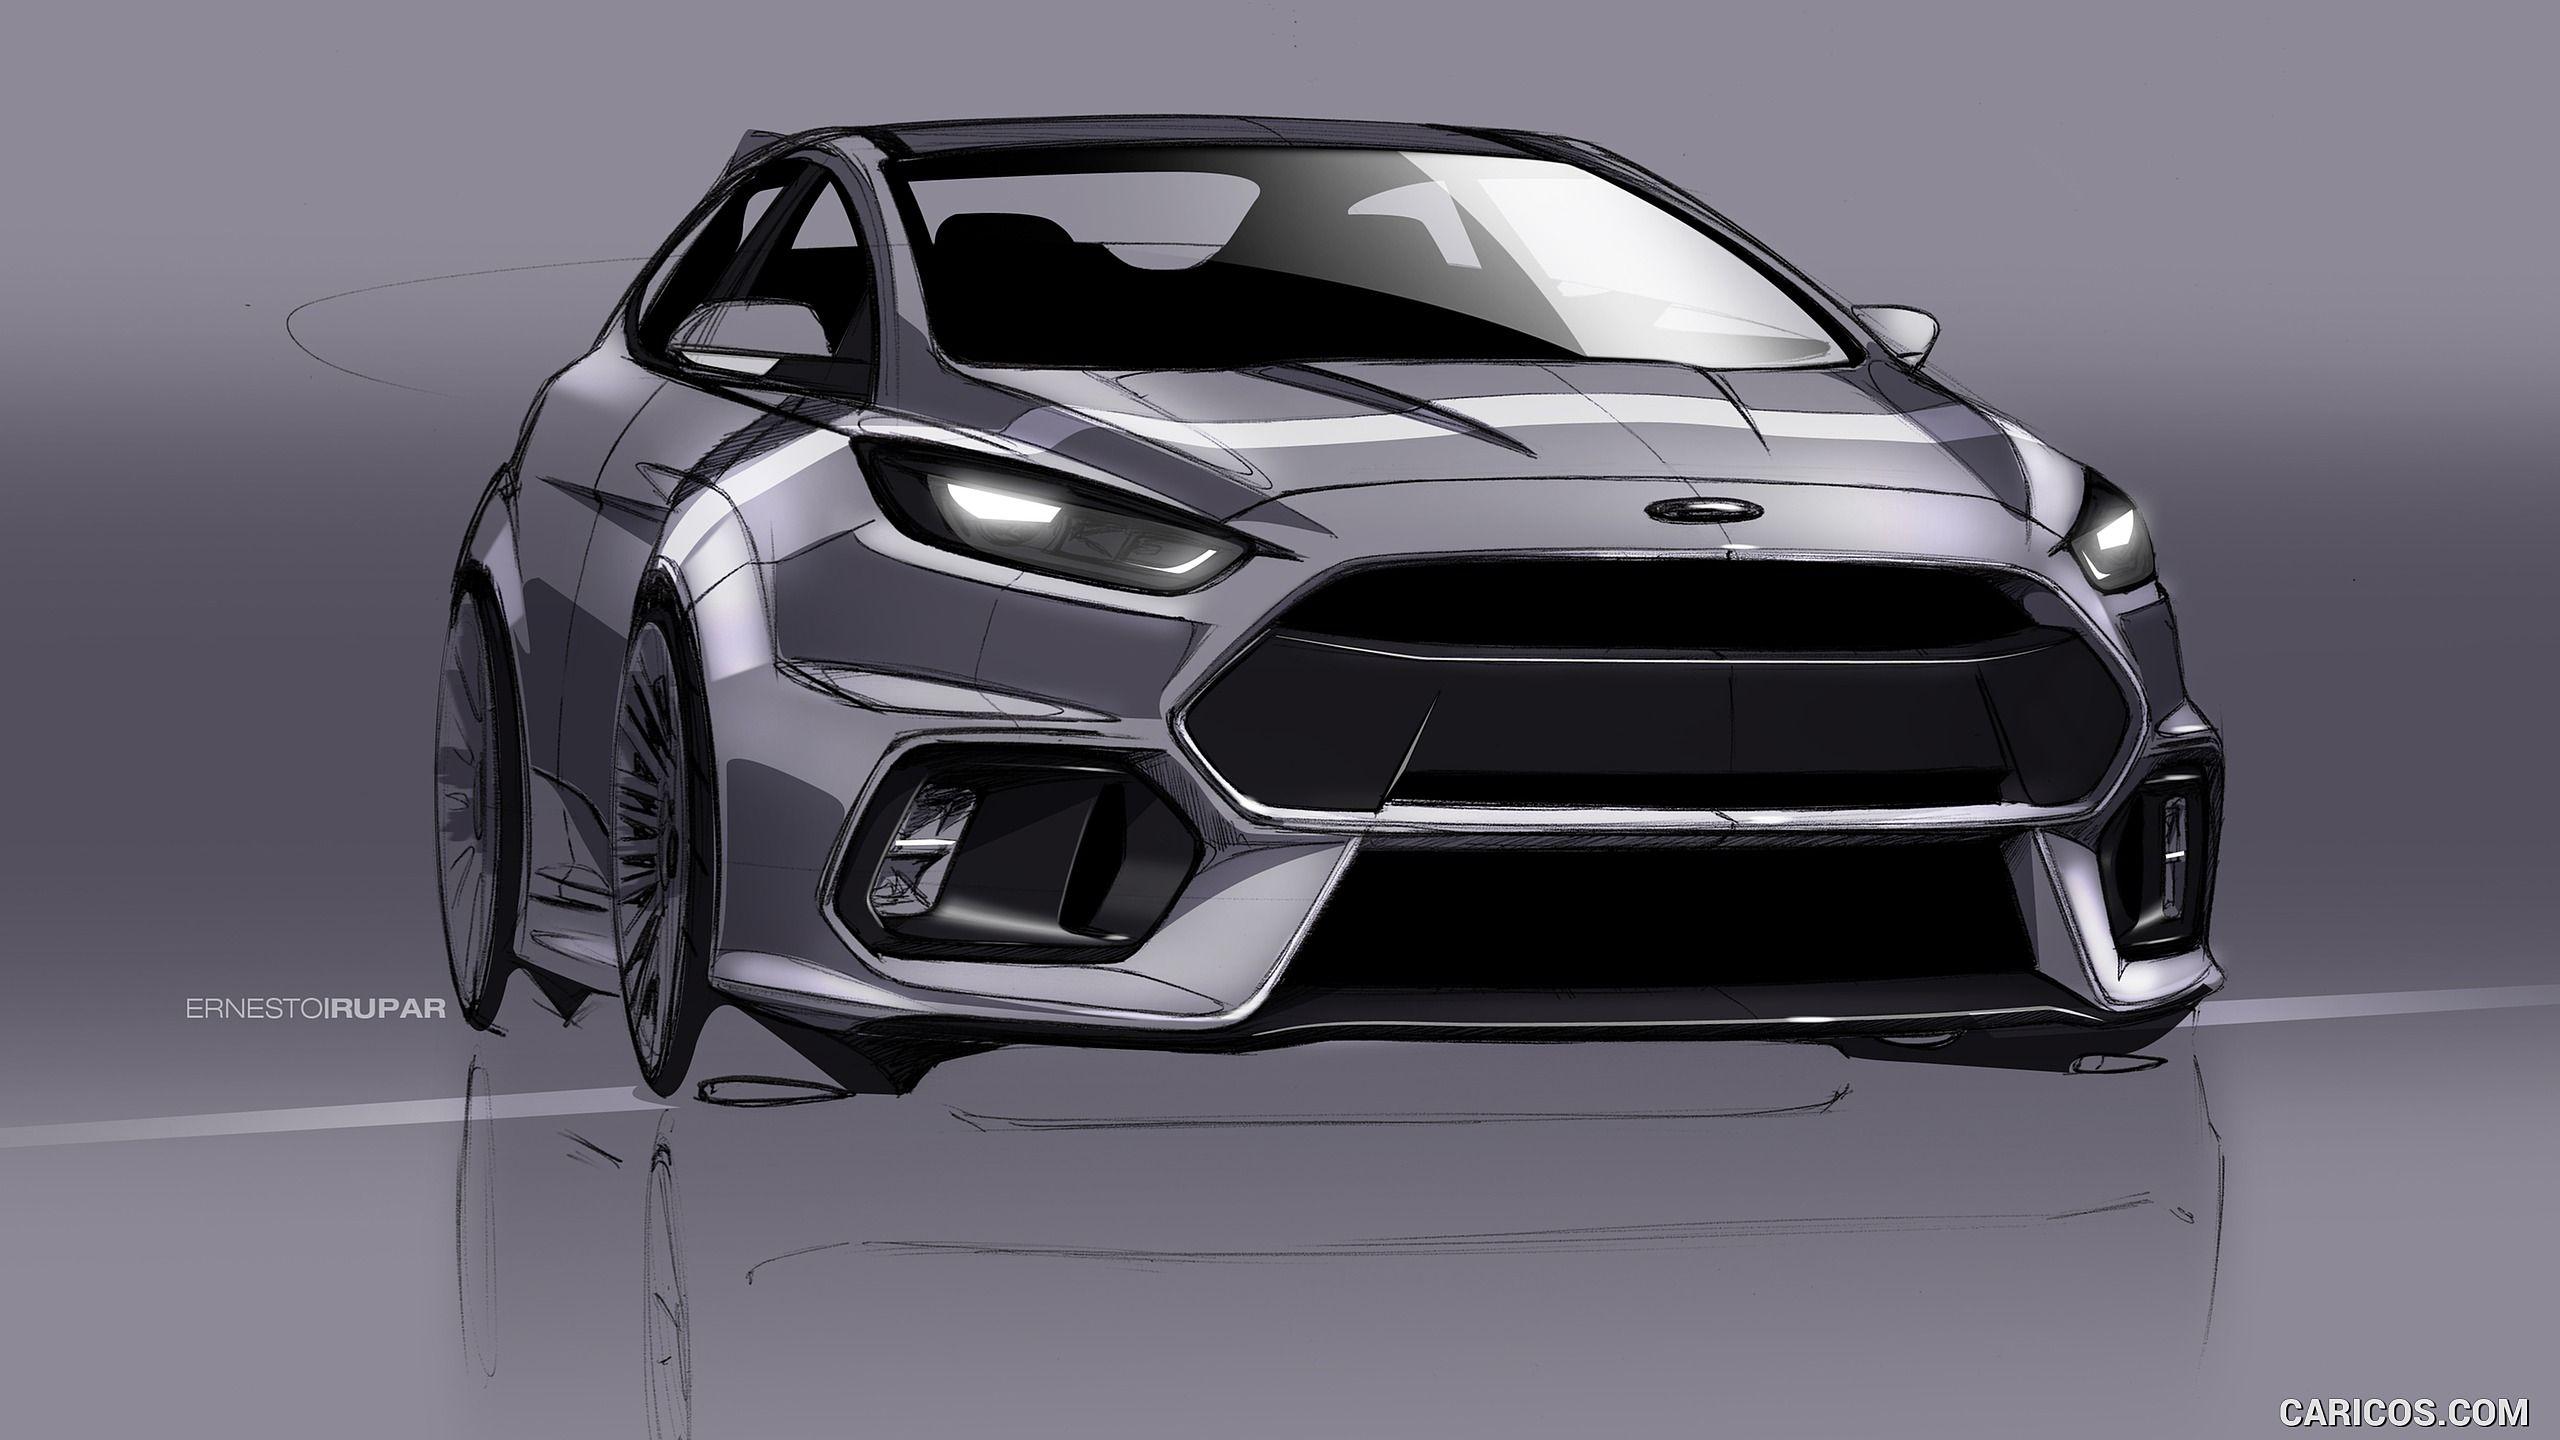 2016 Ford Focus Rs Wallpaper カーデザイン プロダクトデザイン